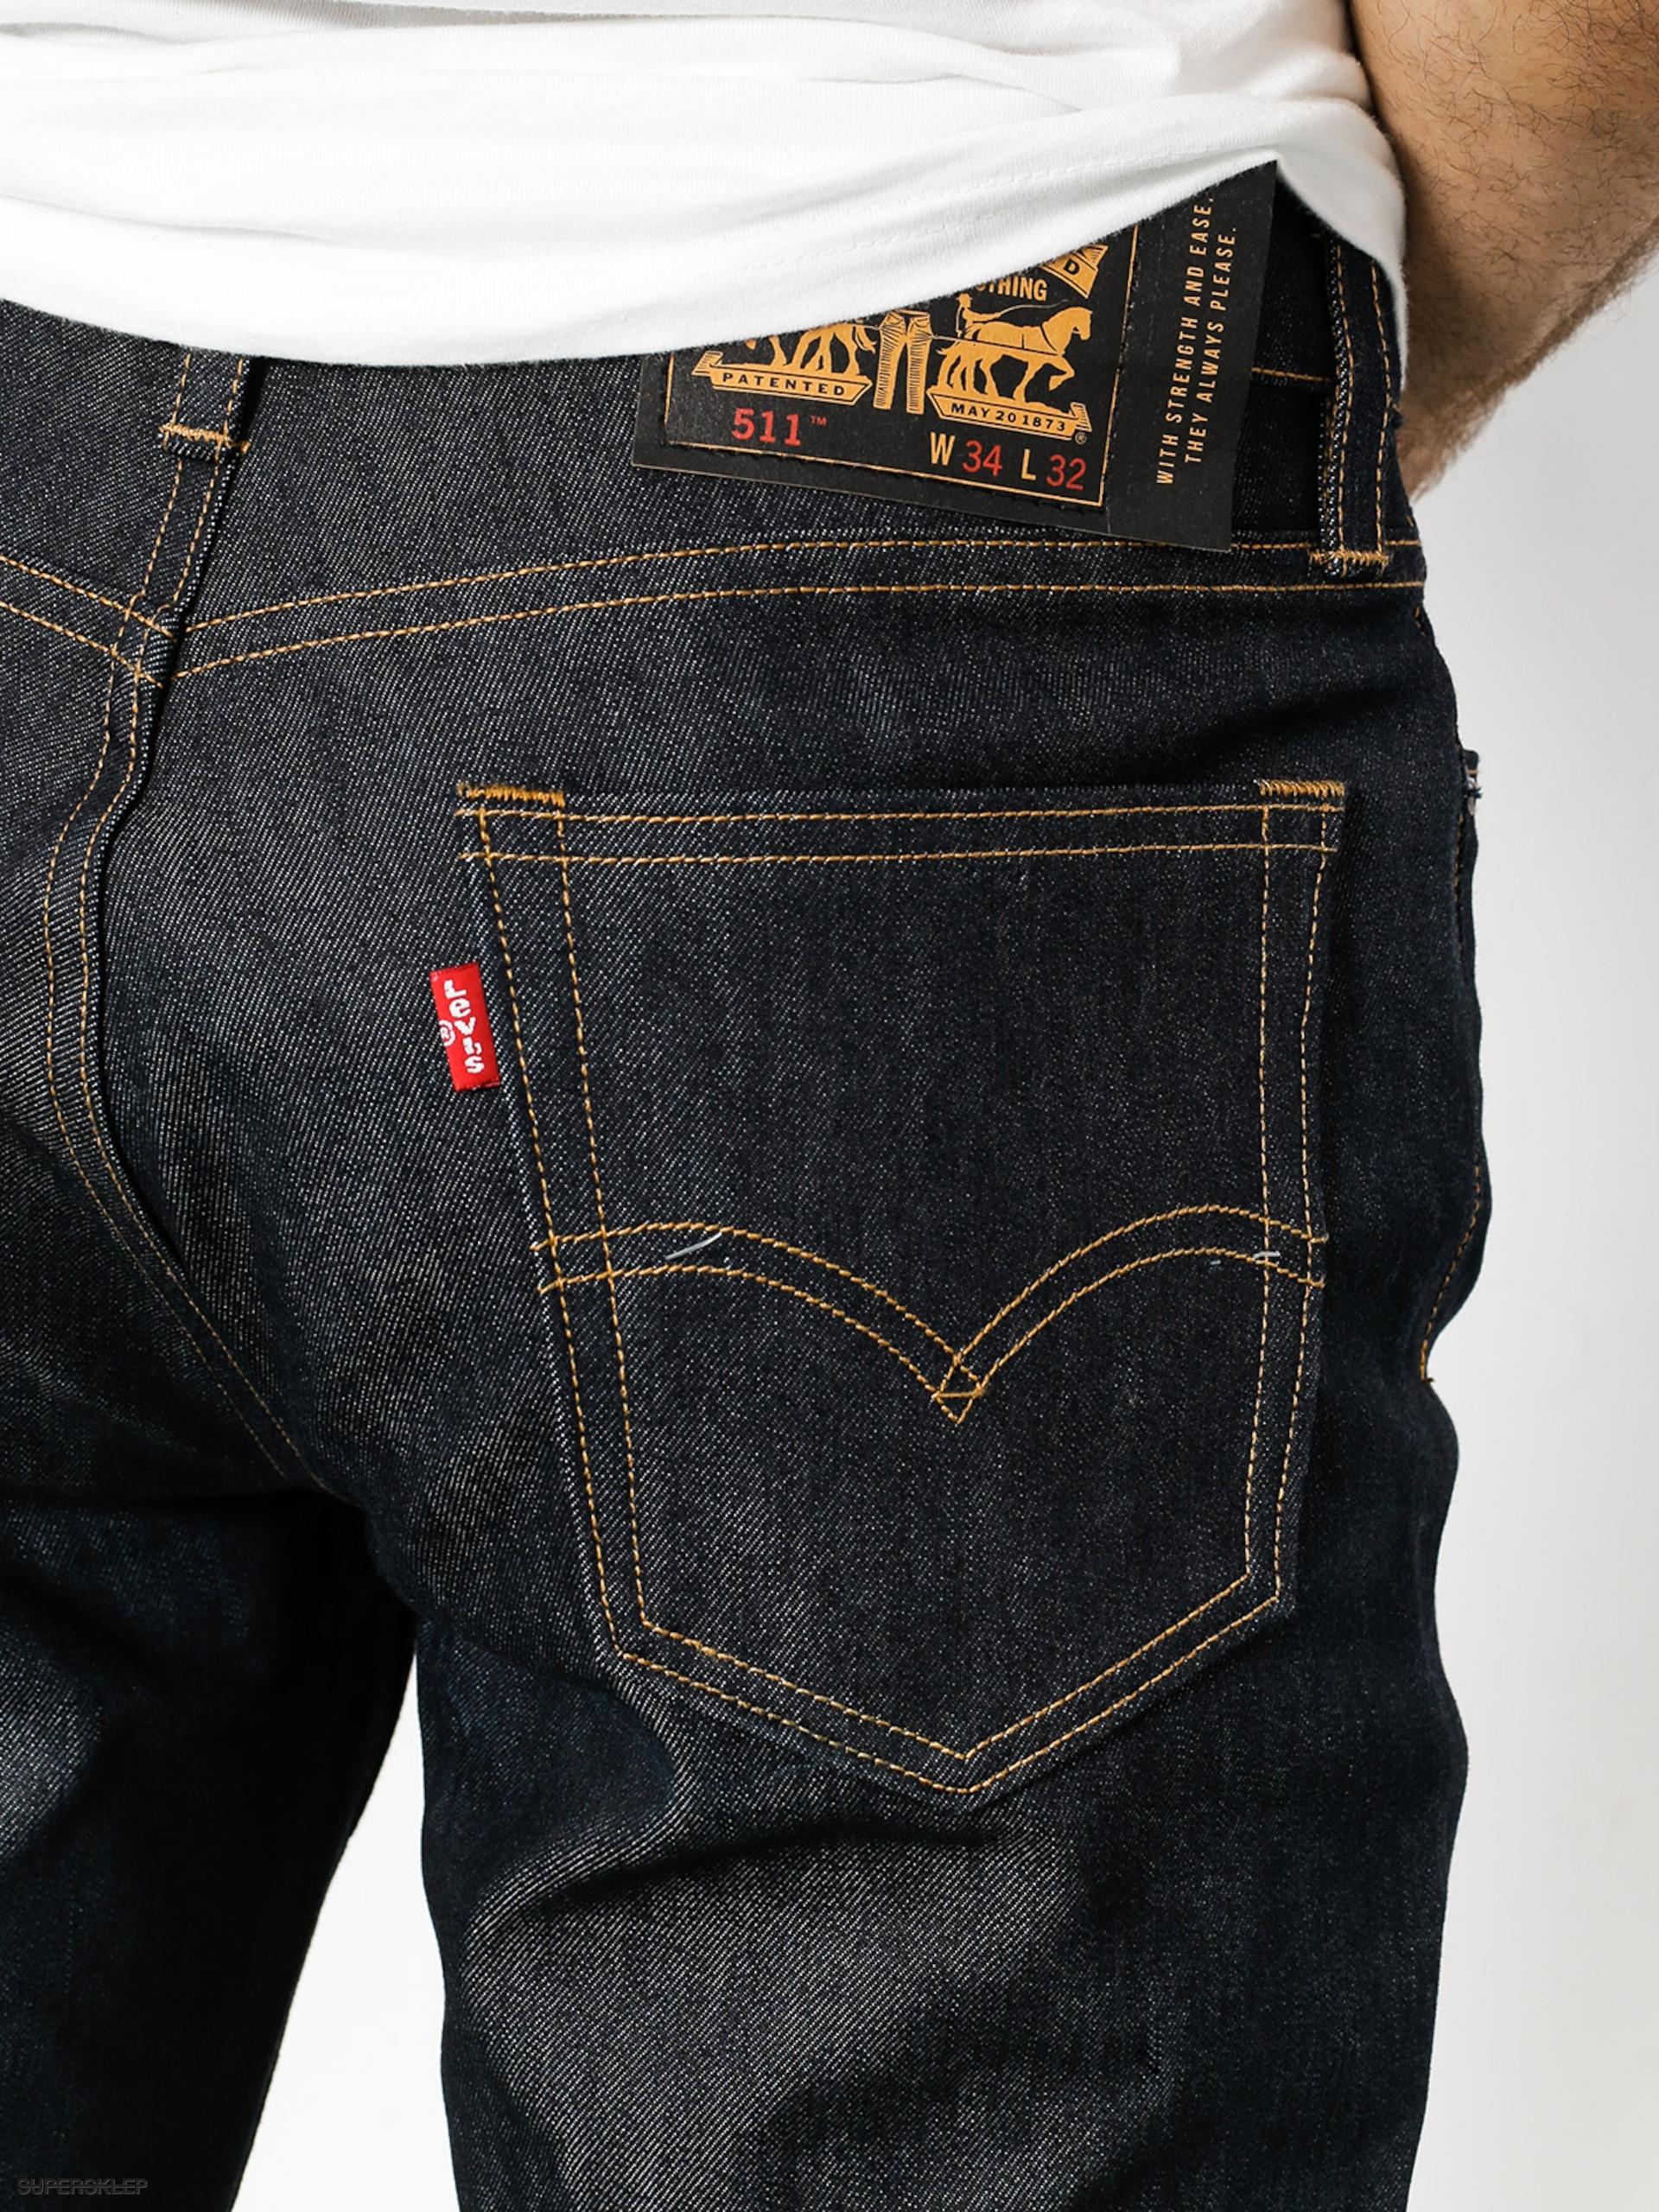 Levi's 5 Spodnie Skate Slim Pocket Indigo 511 Serigid xsdhQrtC